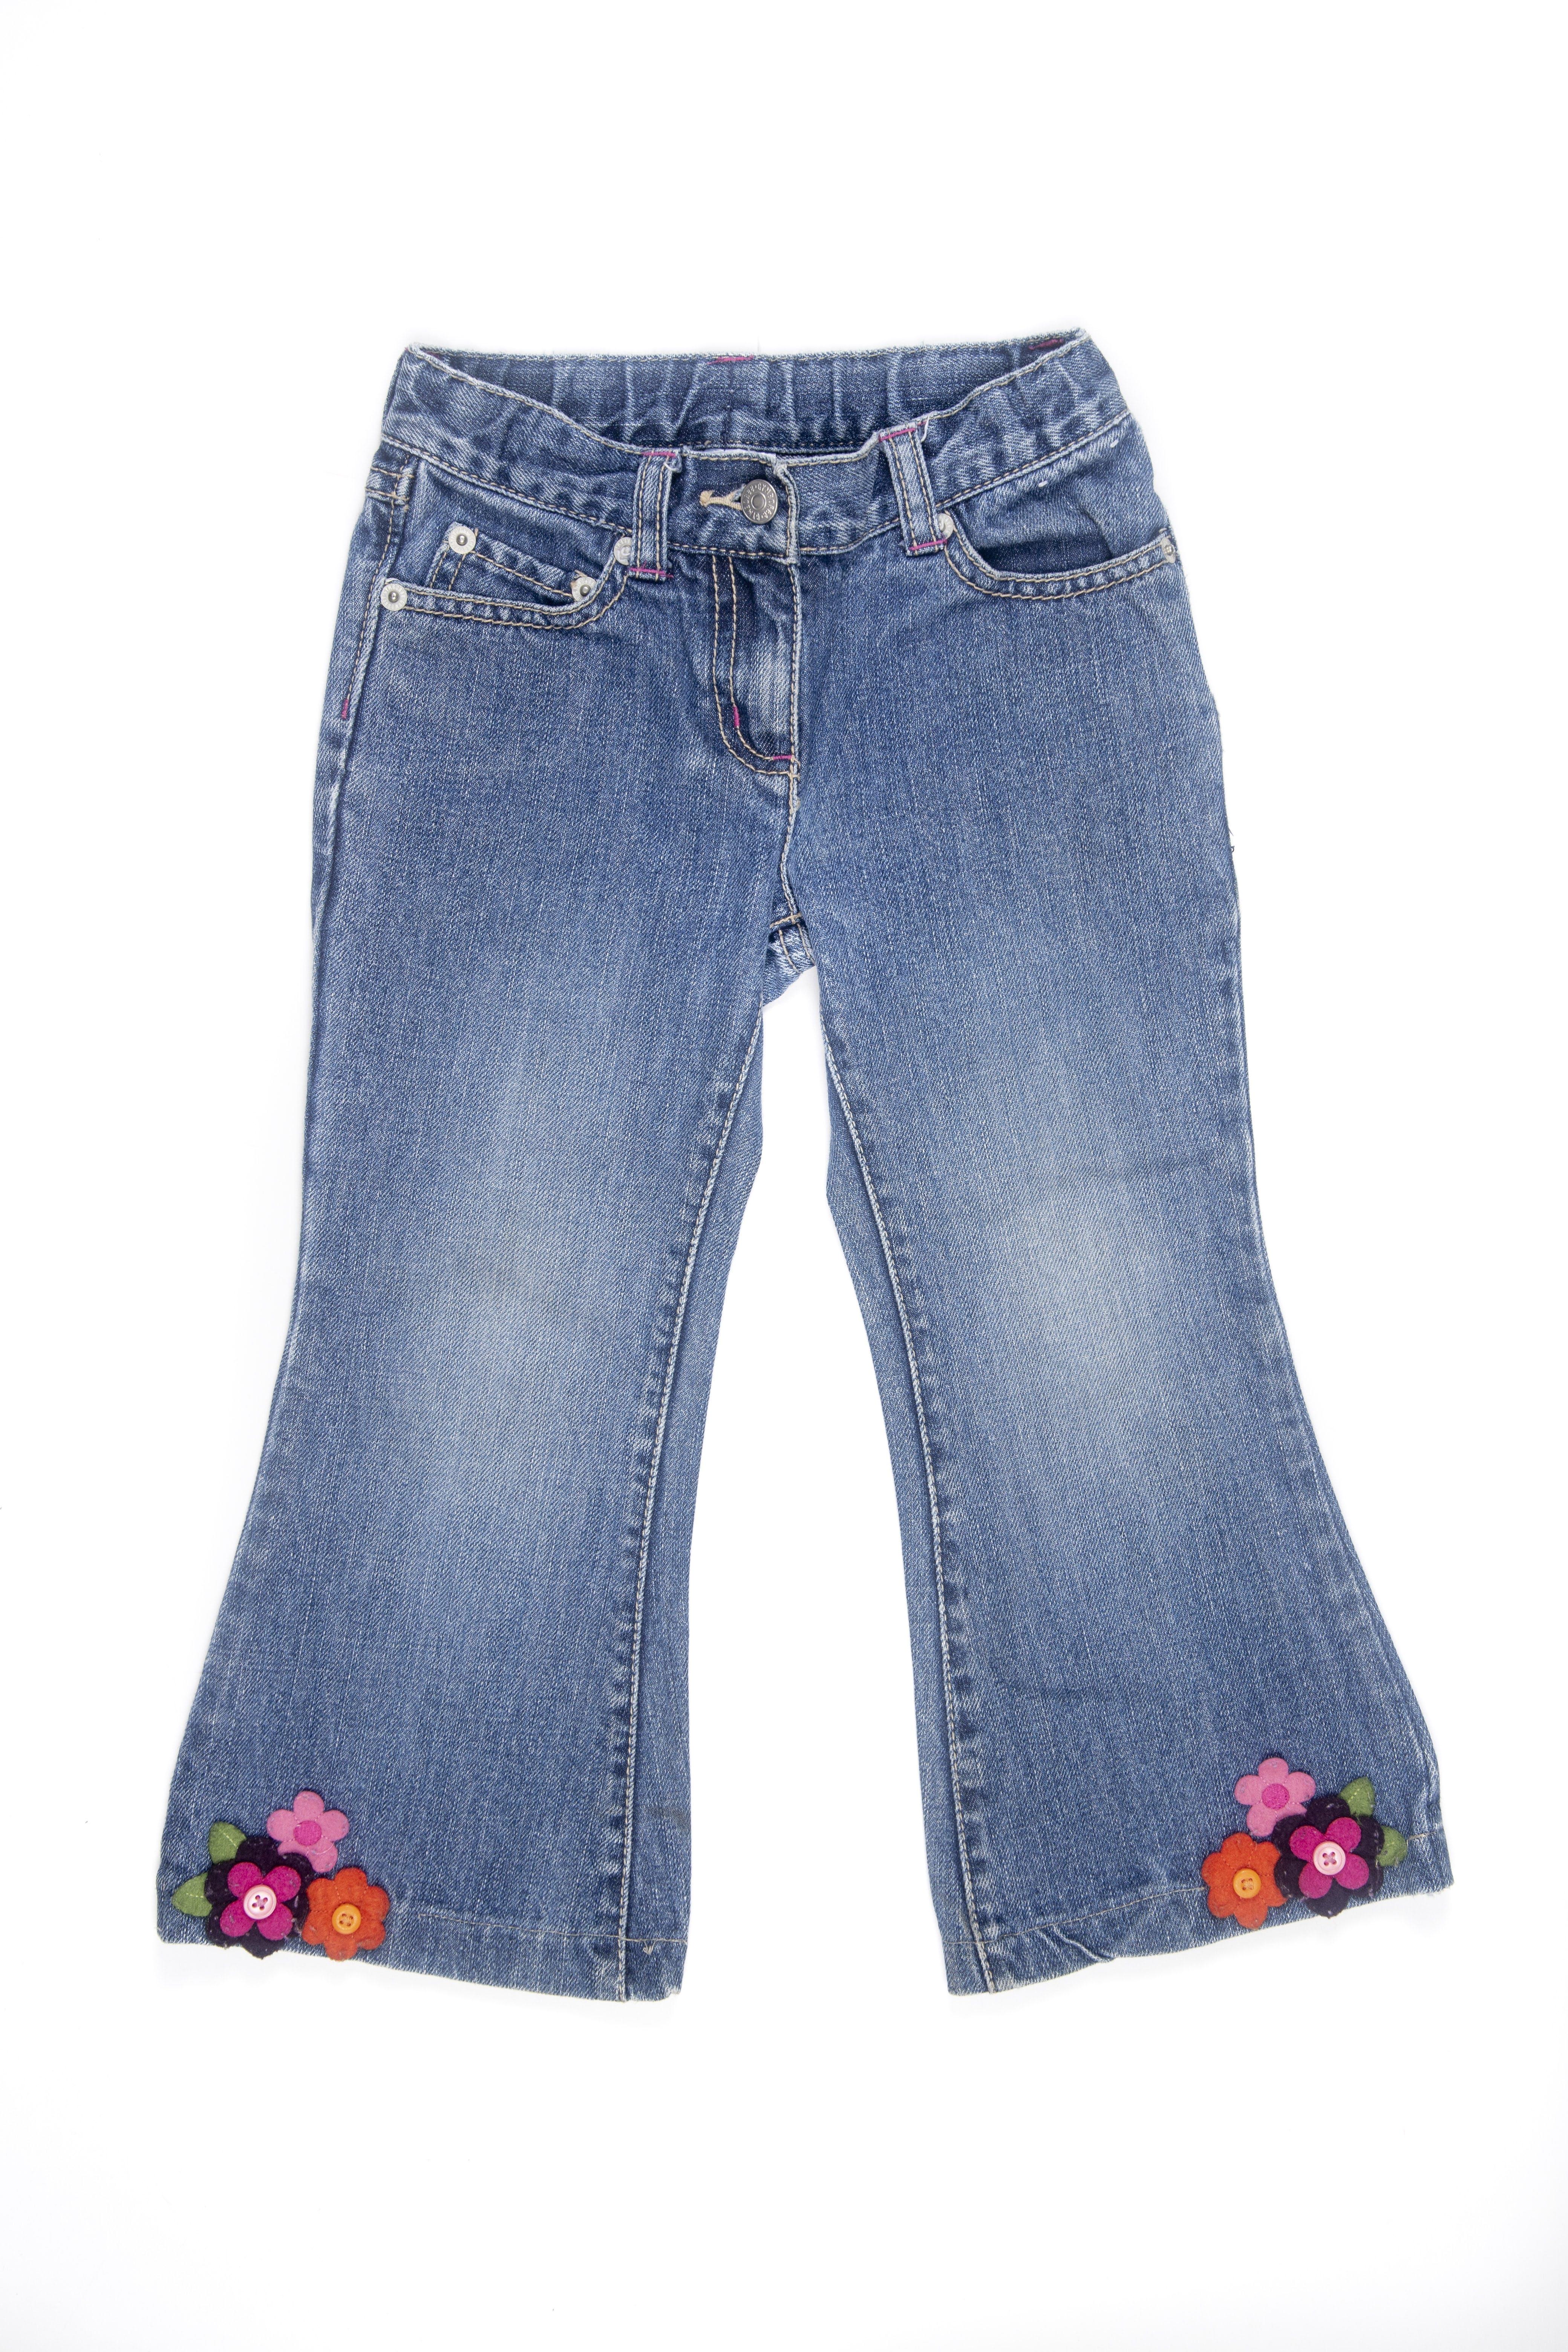 Jean con flores de fieltro en basta, 100% algodón. Cintura regulable - Gymboree